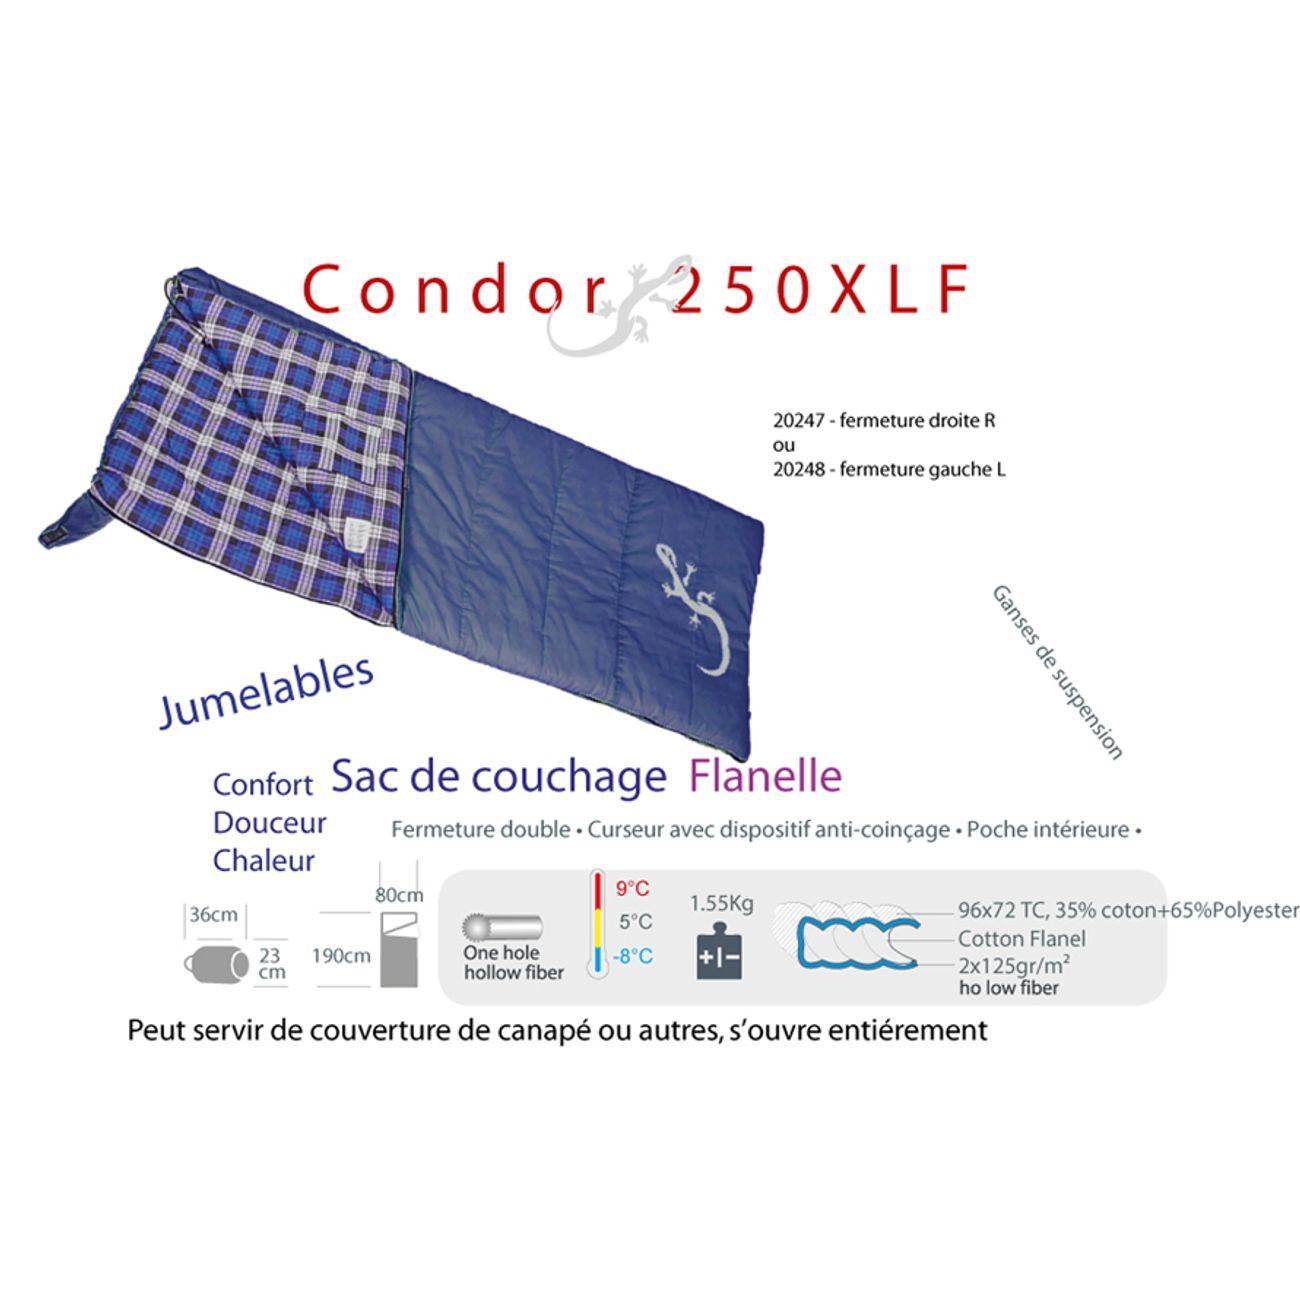 Camping  FREETIME CONDOR 250xlf-Flanelle - Sac de couchage pour camping - Sac couchage couvertures -zip Droit